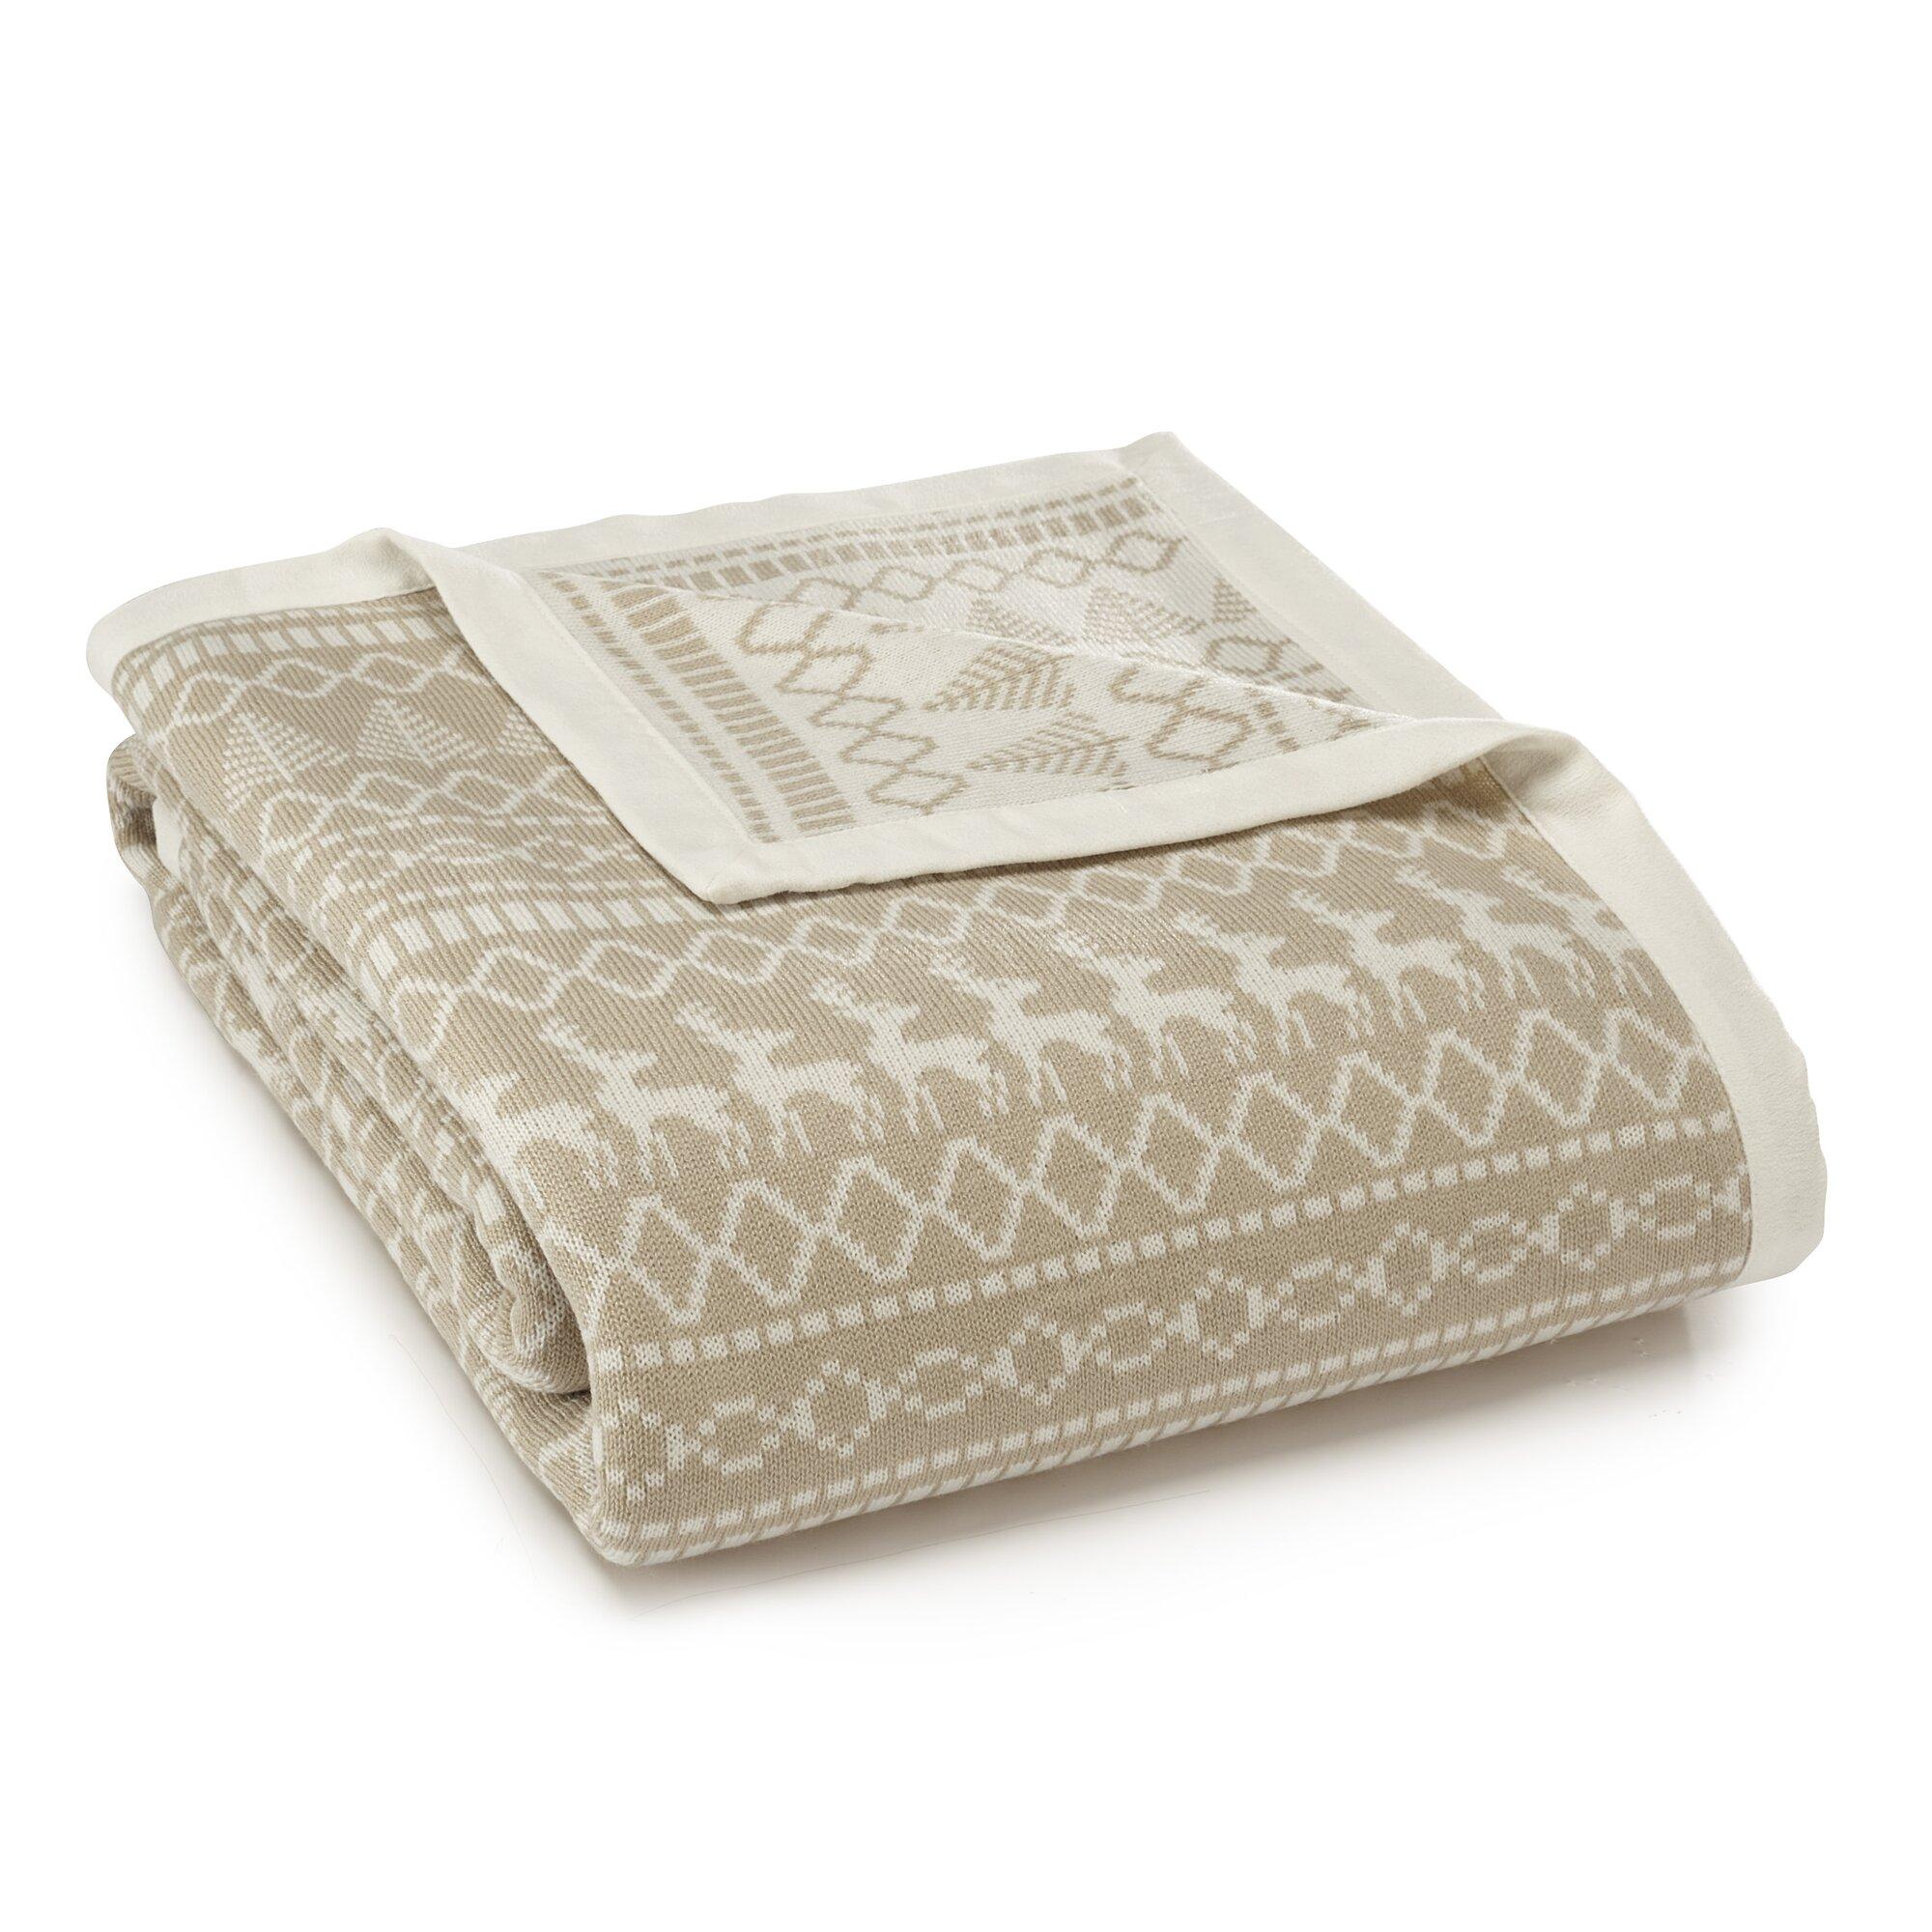 duvet images pinterest on best winterbedroom beddingstyle bauer and eddie mountain bed comforter set bedding plaid scarlet